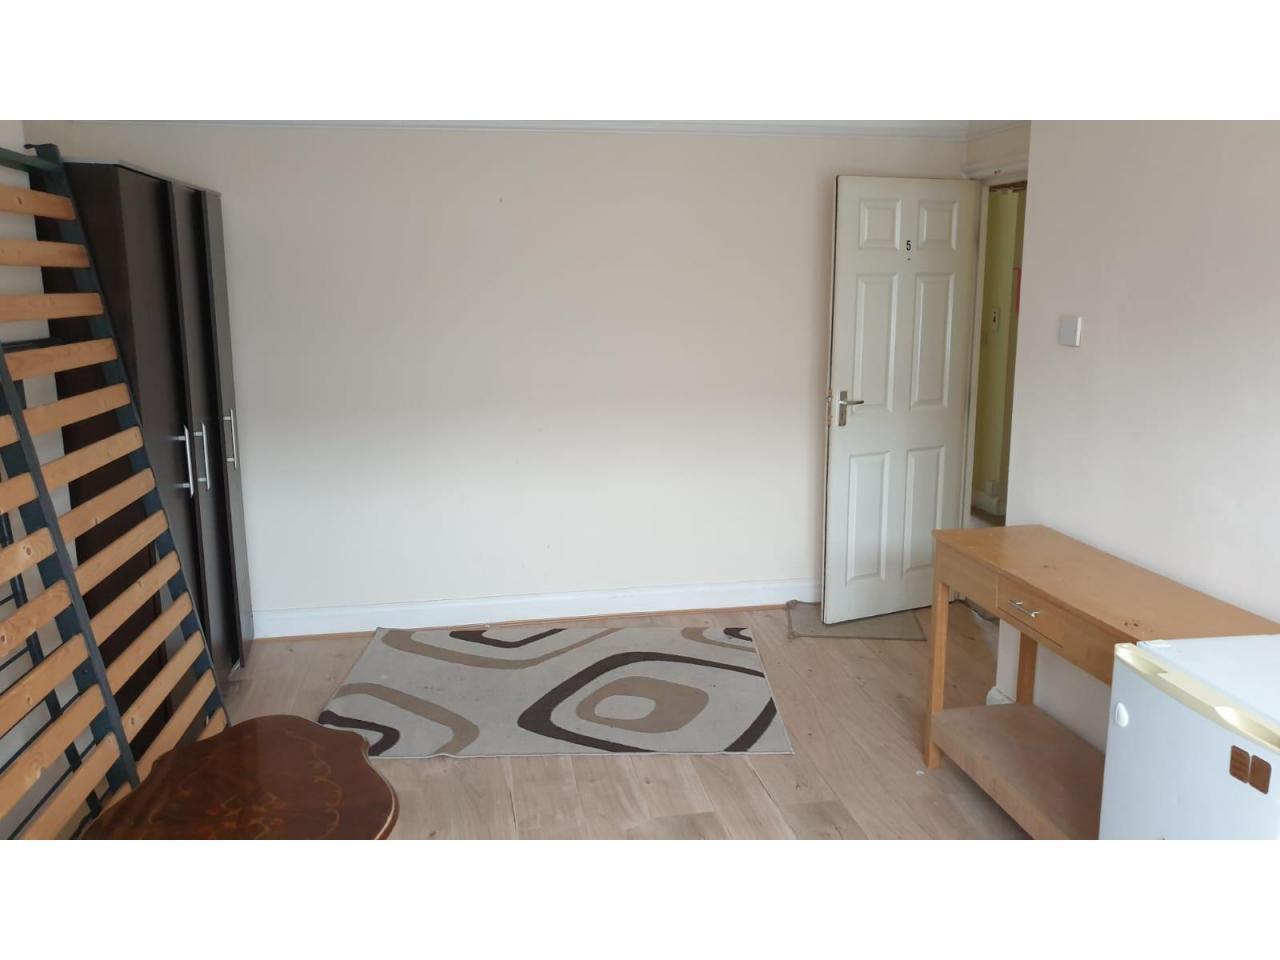 Double Kомната в аренду - Harlesden, Willesden Junction - все счета включены - 3